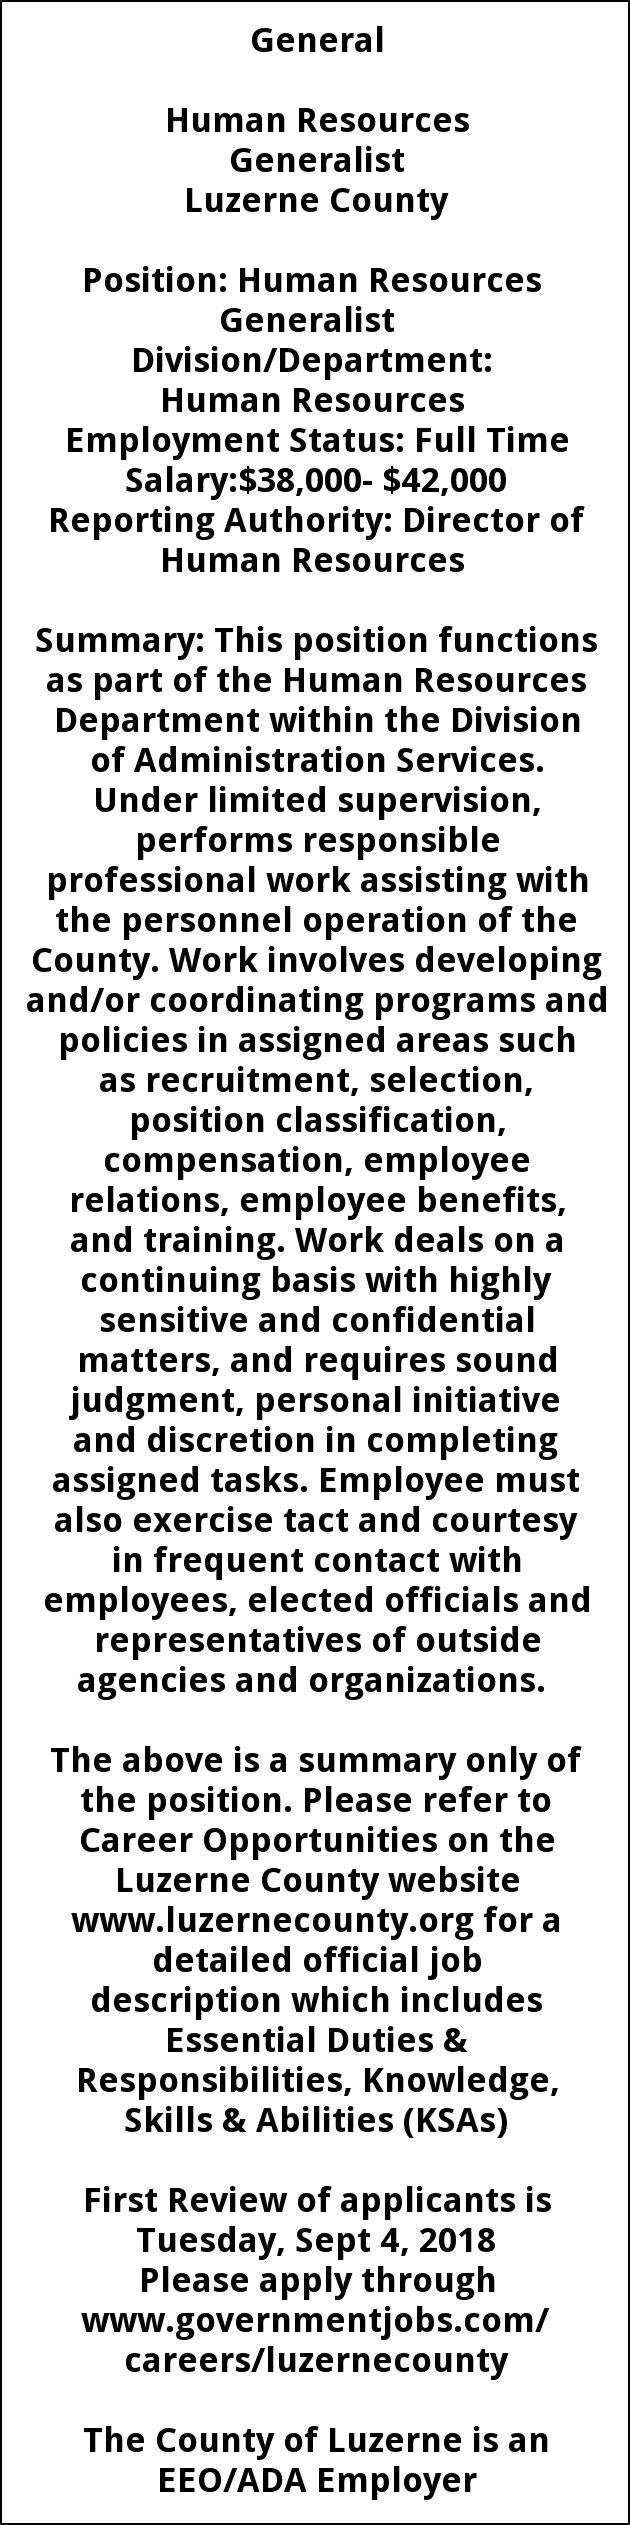 Human Resources Generalist, Luzerne County